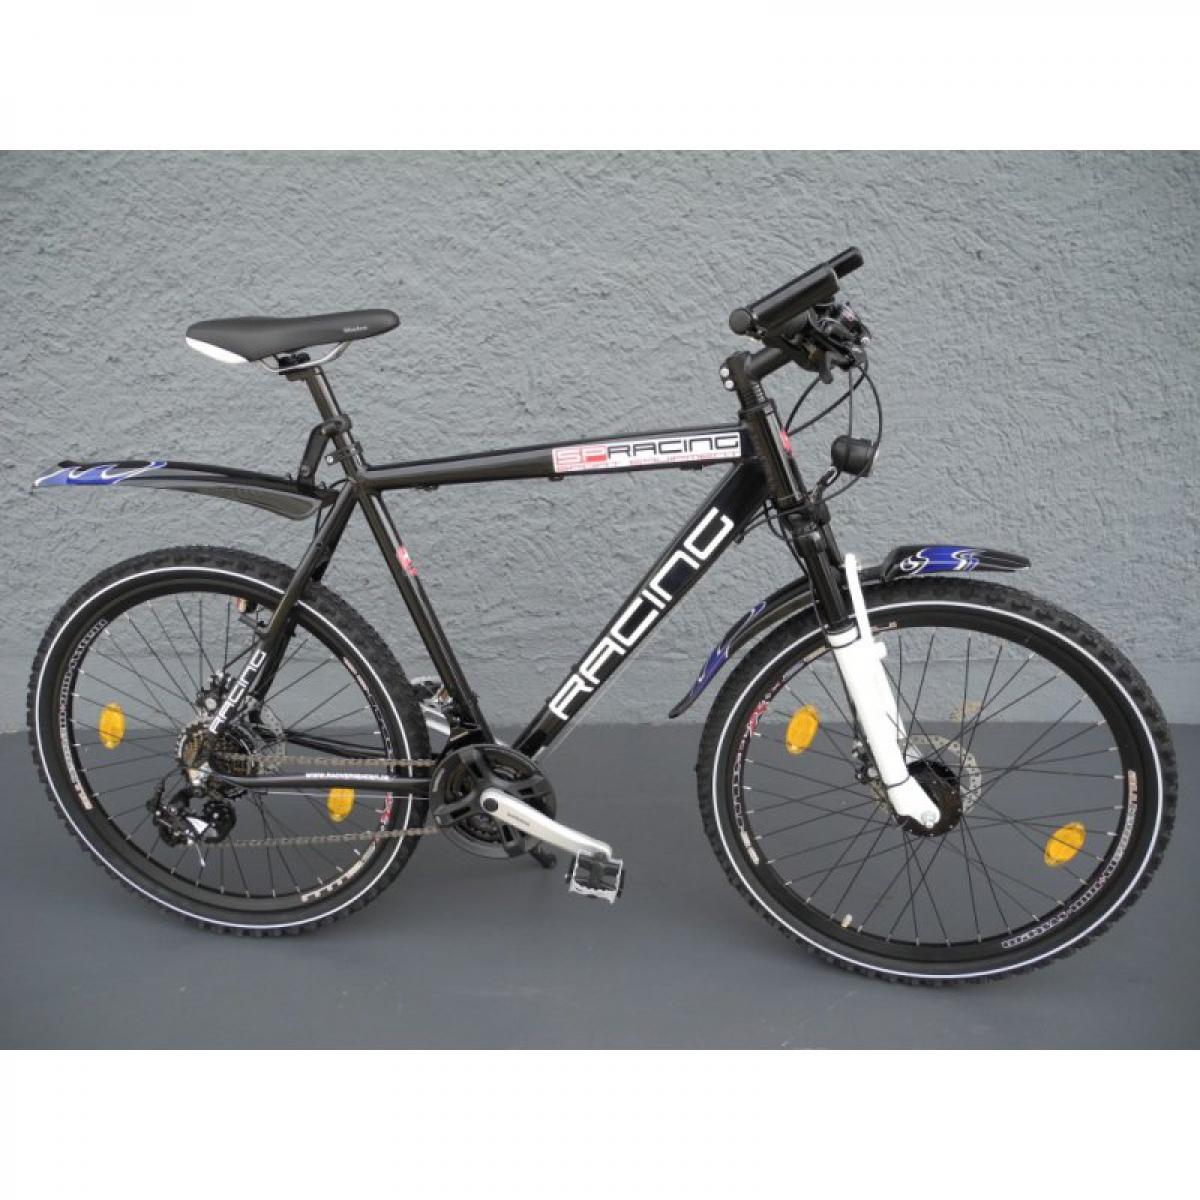 26 zoll alu mtb fahrrad 21 gang shimano nabendynamo stvzo disc ihr fahrrad online shop bei